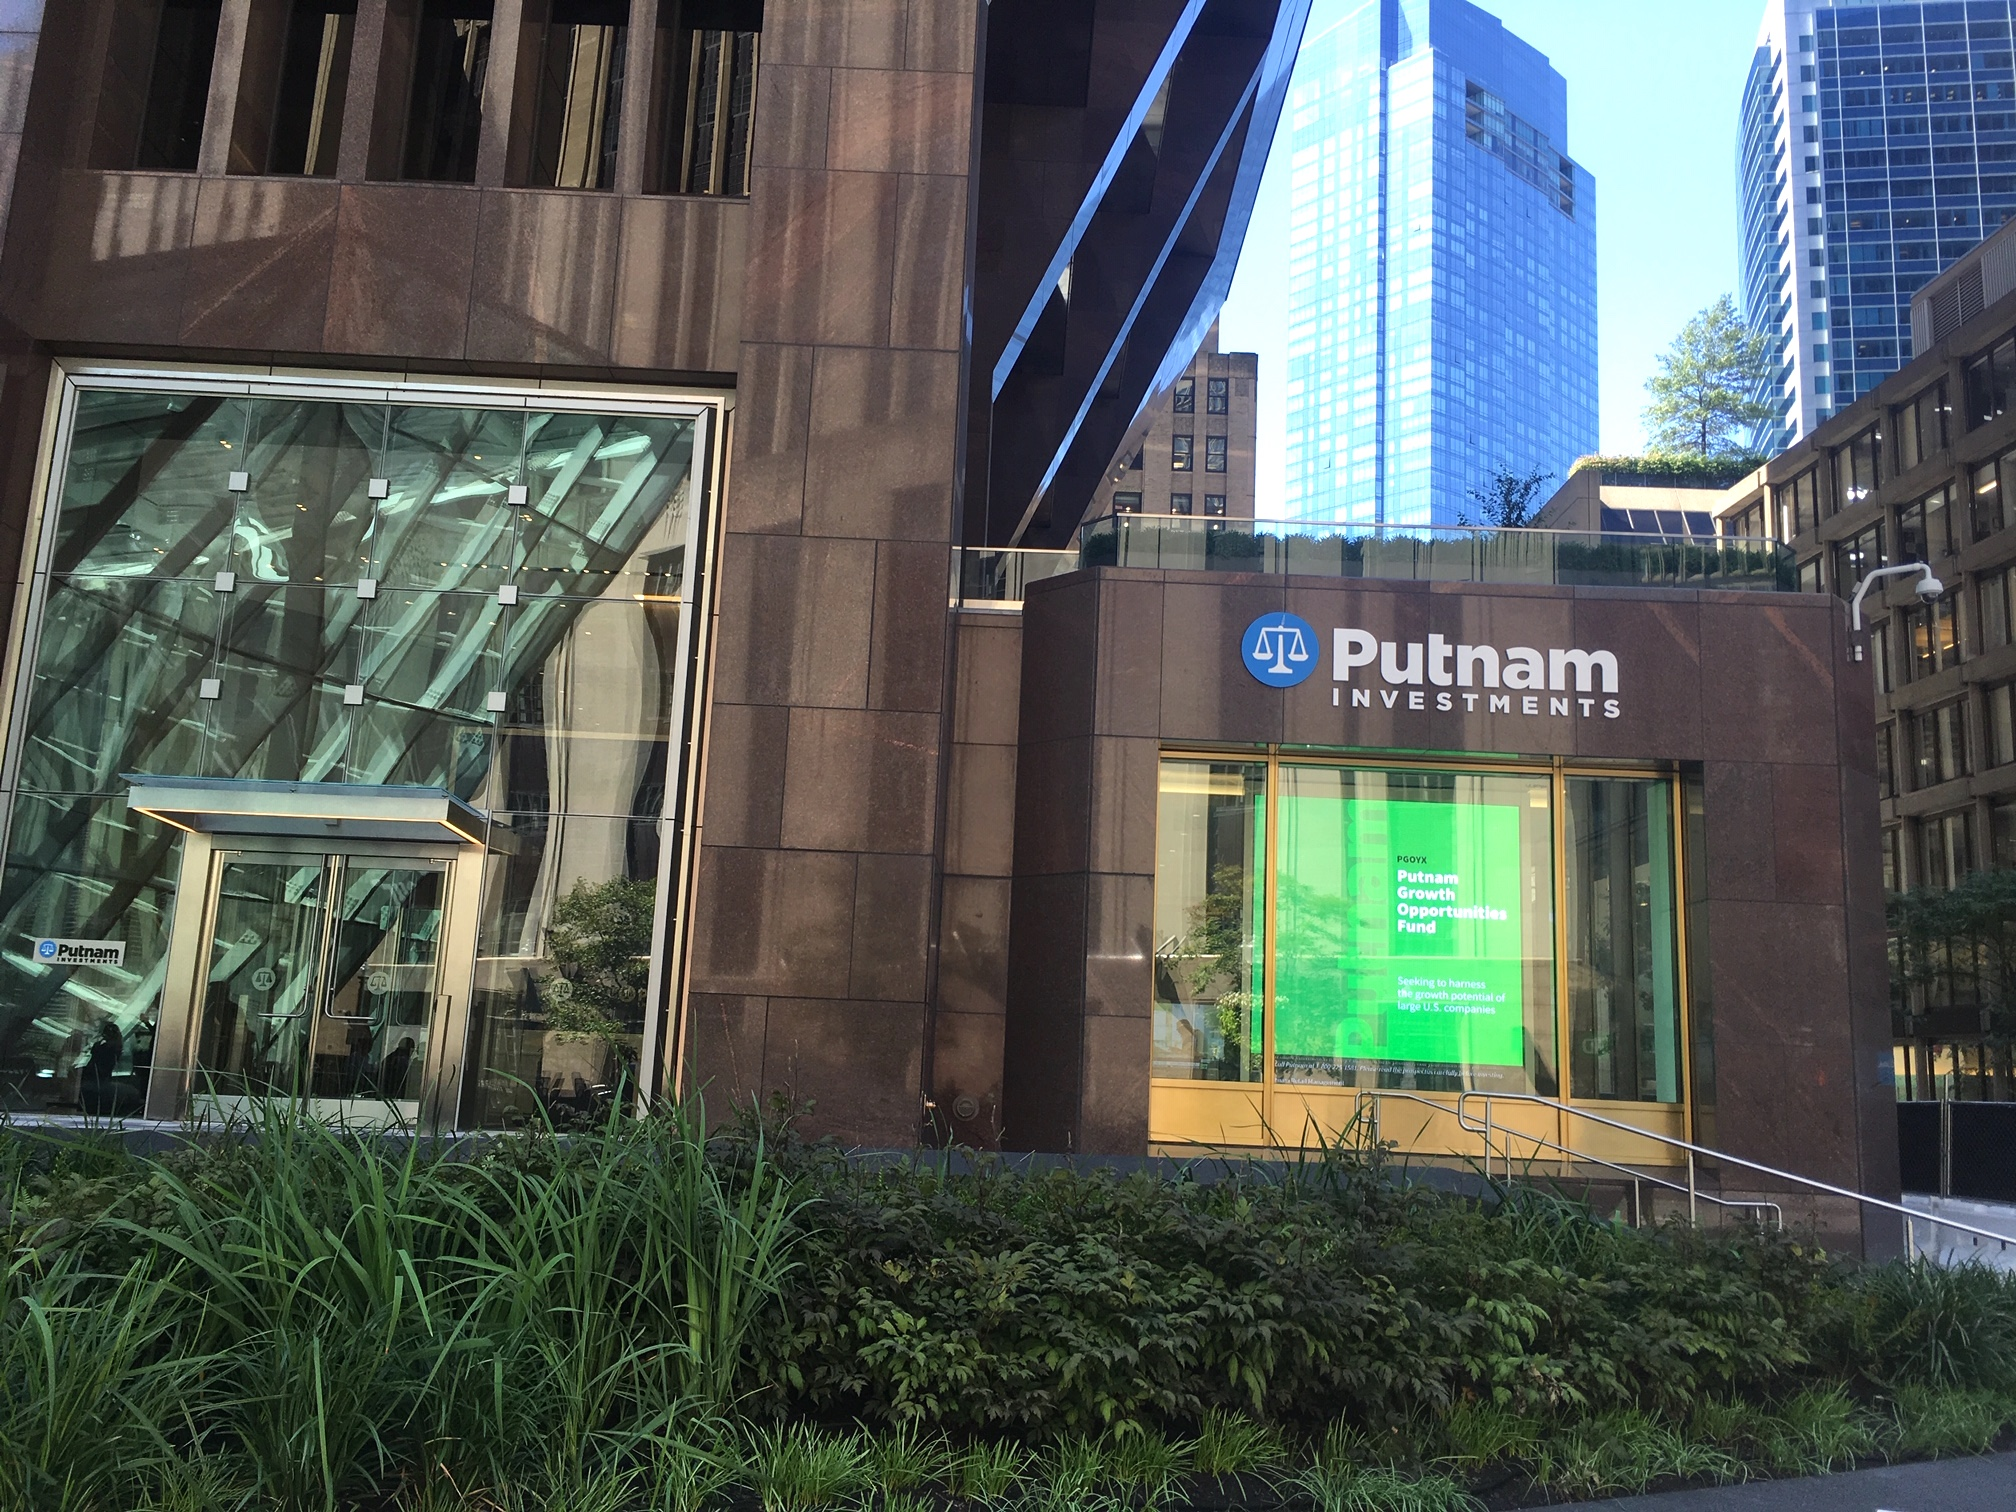 Putnam Investments Global Headquarters, 100 Federal Street, Boston, MA